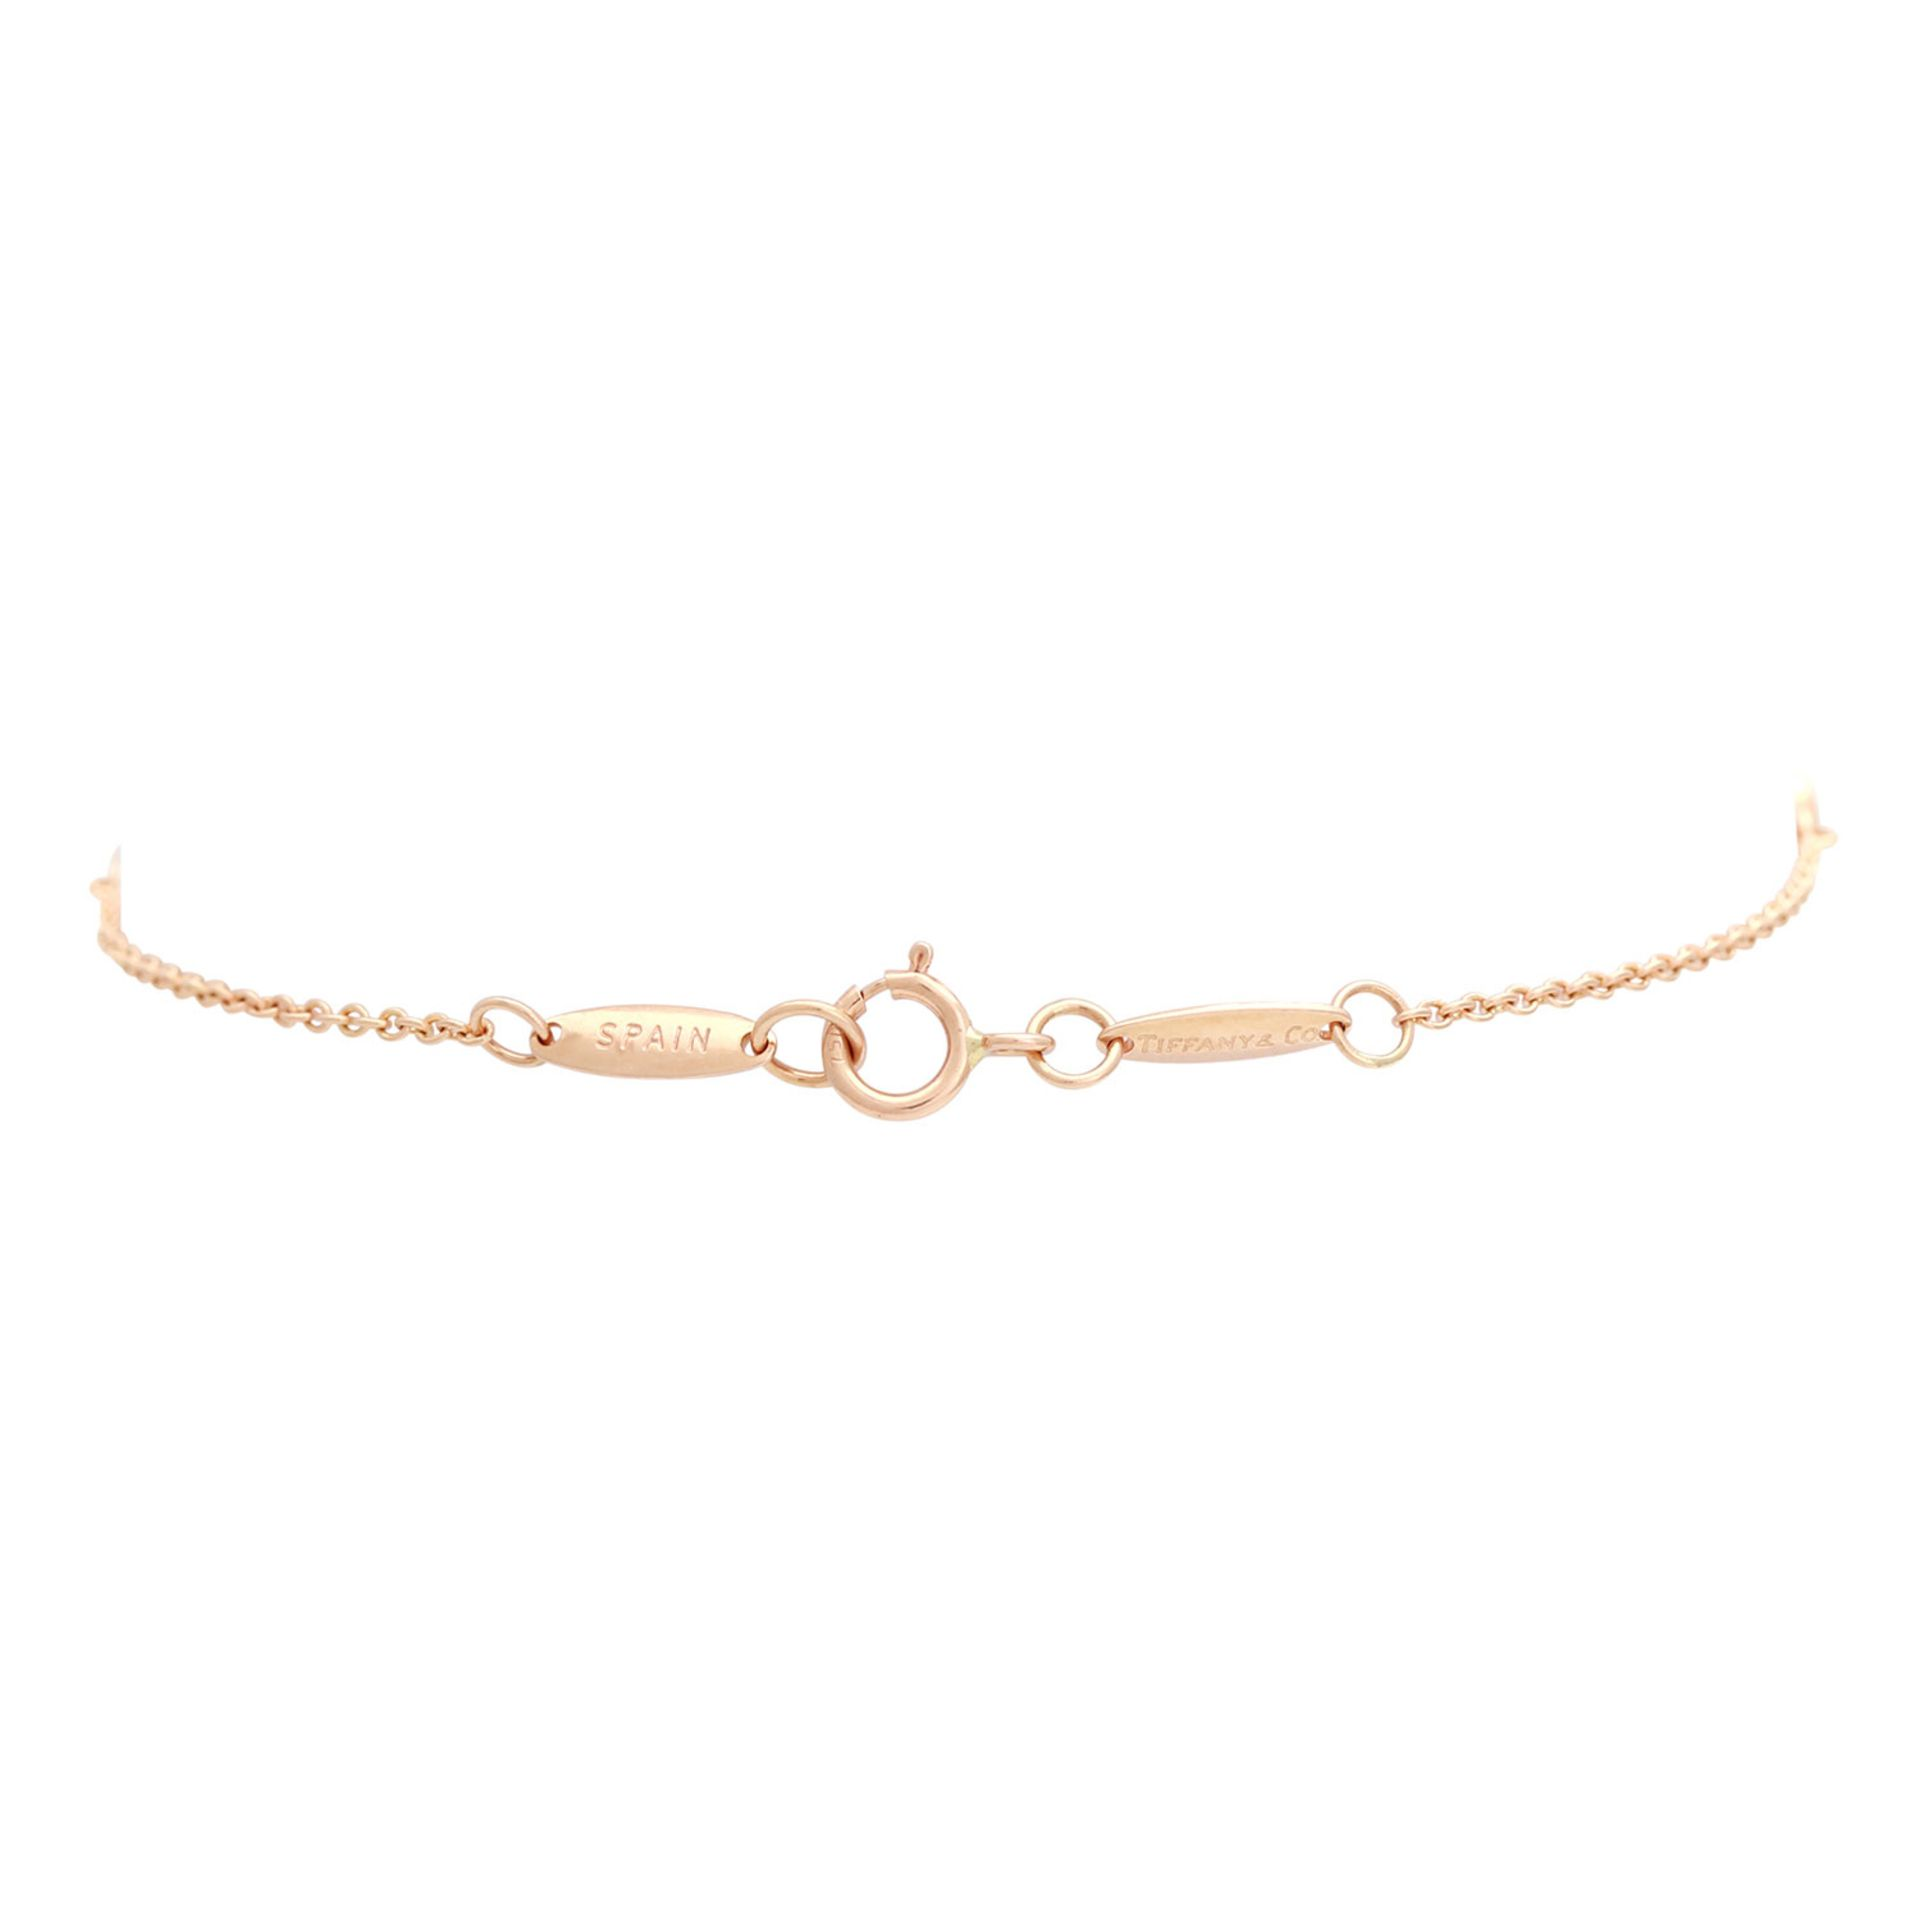 "Los 37 - TIFFANY & CO zartes Armband ""Diamonds by the Yard"" mit 3 Brillanten zus. ca. 0,09 ct FW / VVSI in RG"